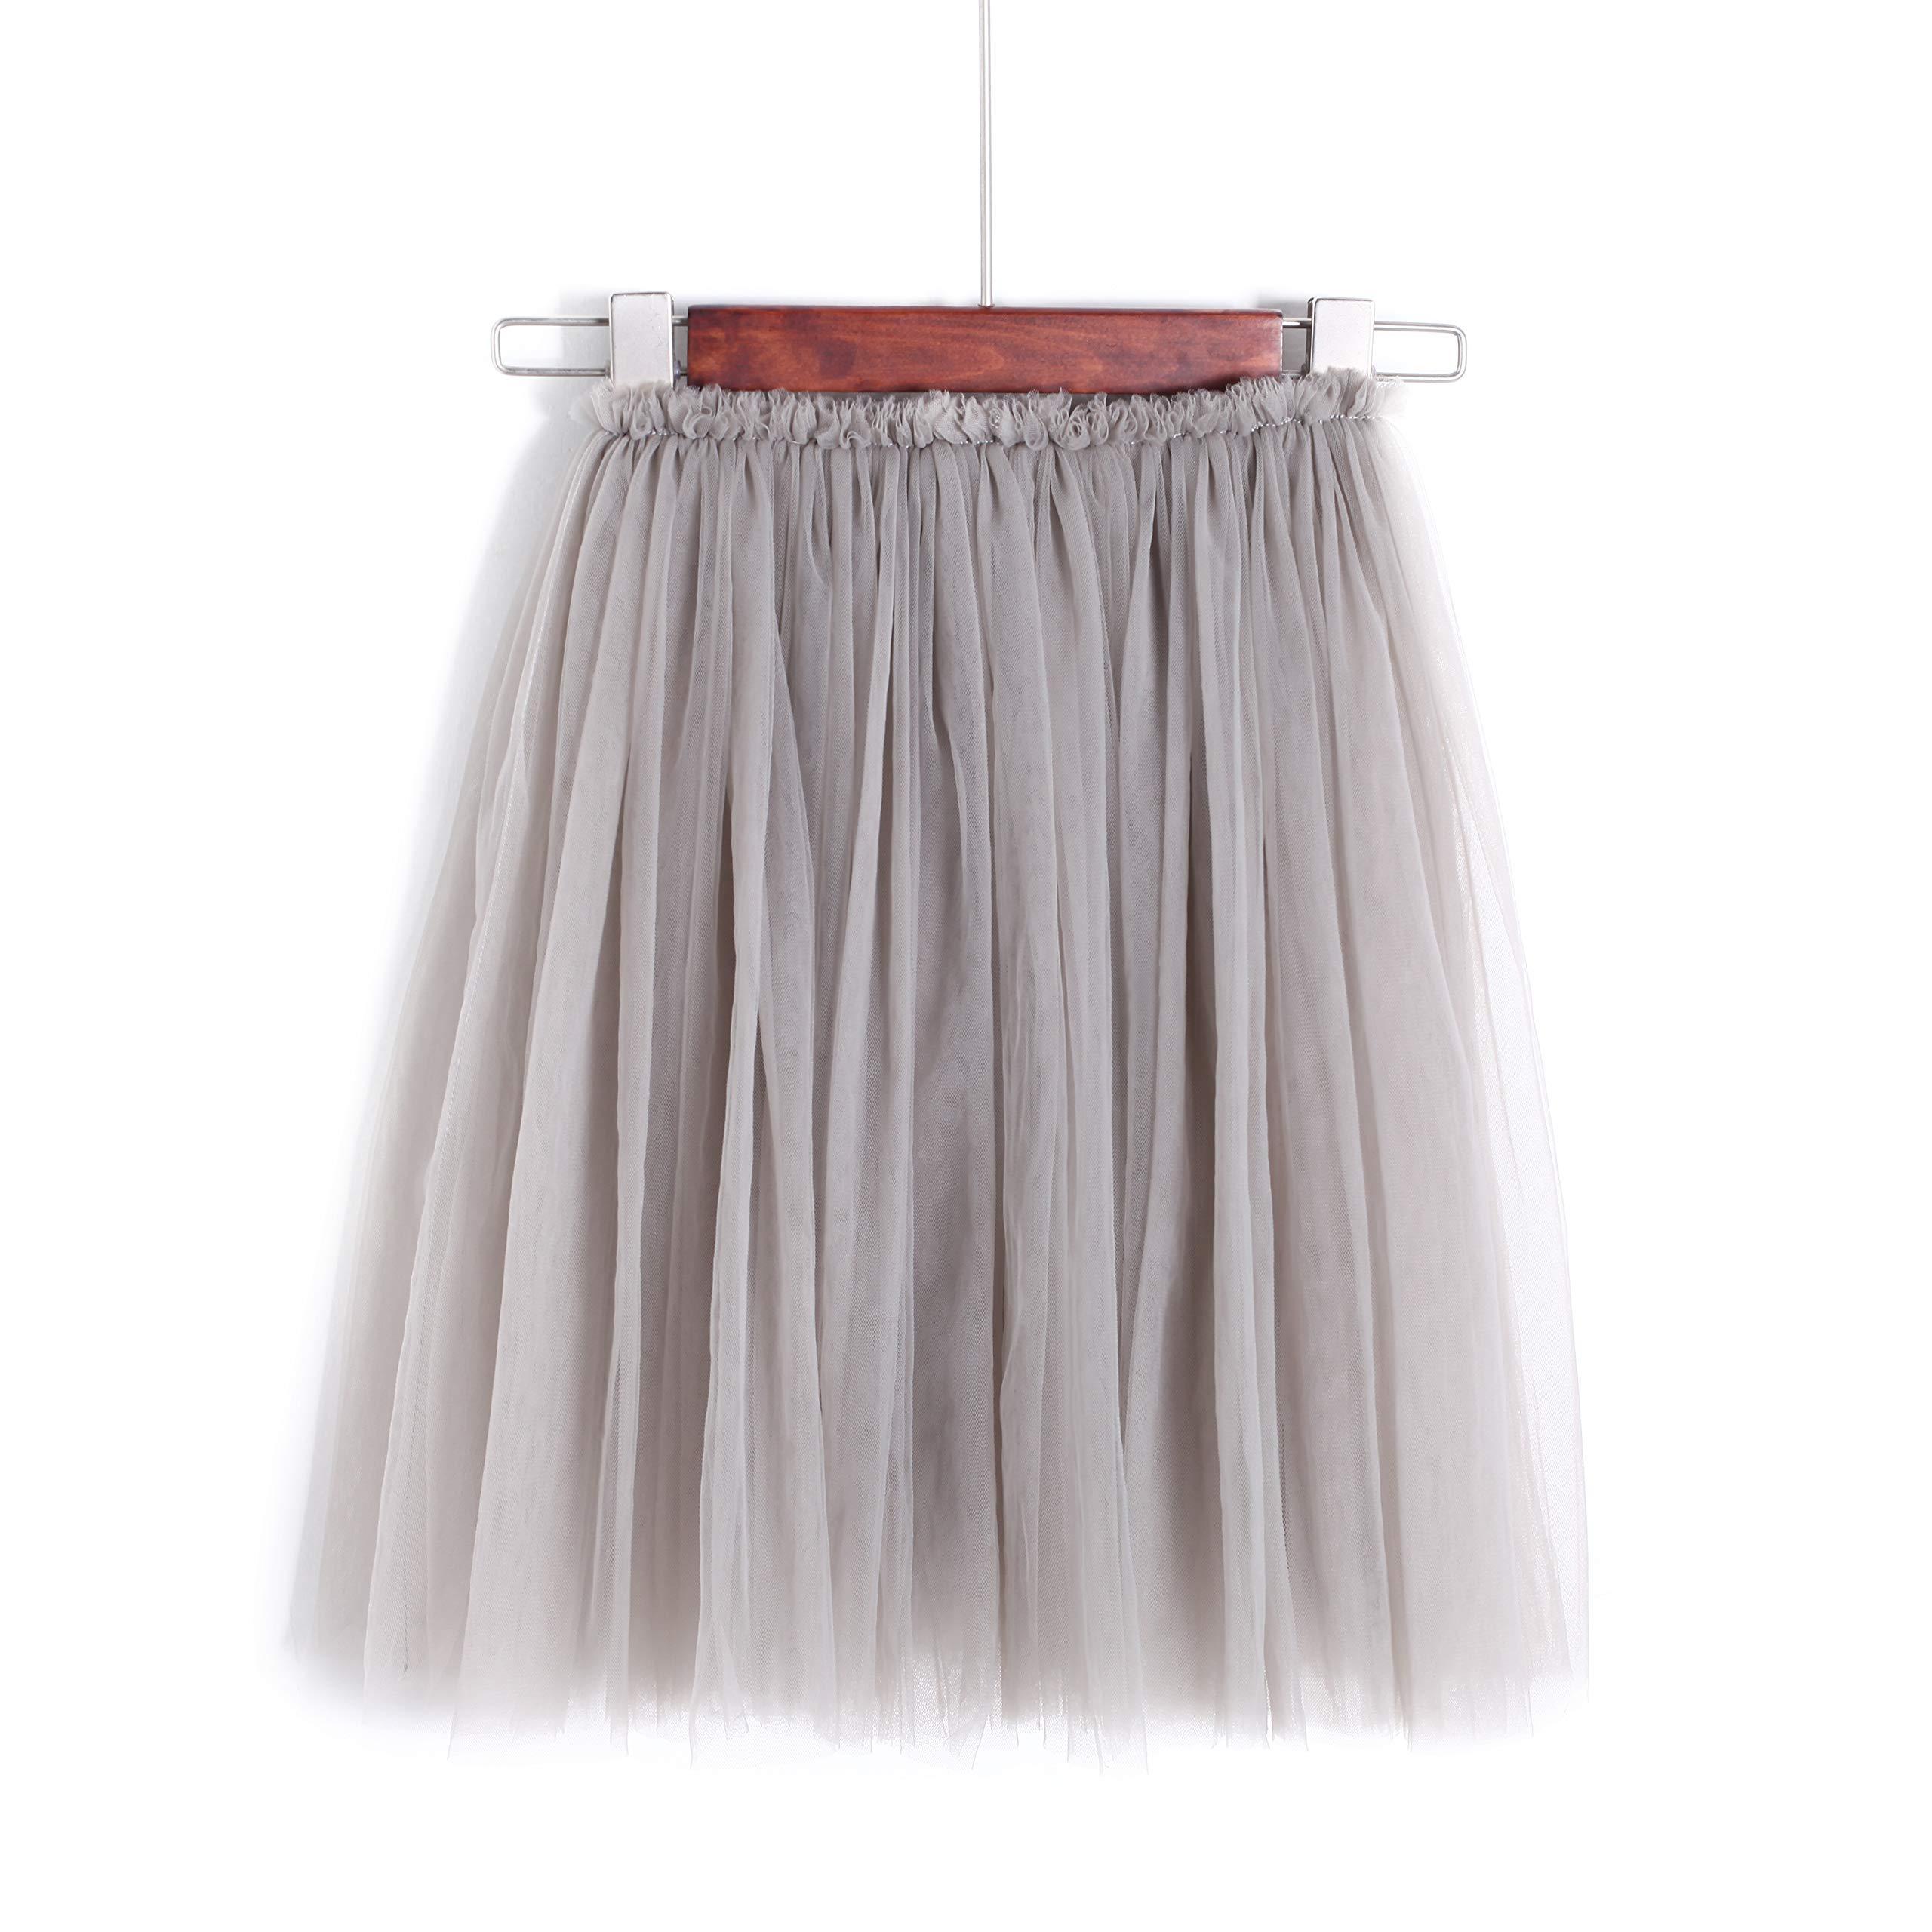 Flofallzique Tulle Tutu Girls Skirt Mid Calf 1-9 Year Old Toddler Skirt Dancing Skirt Girls Clothes (1, Gray)